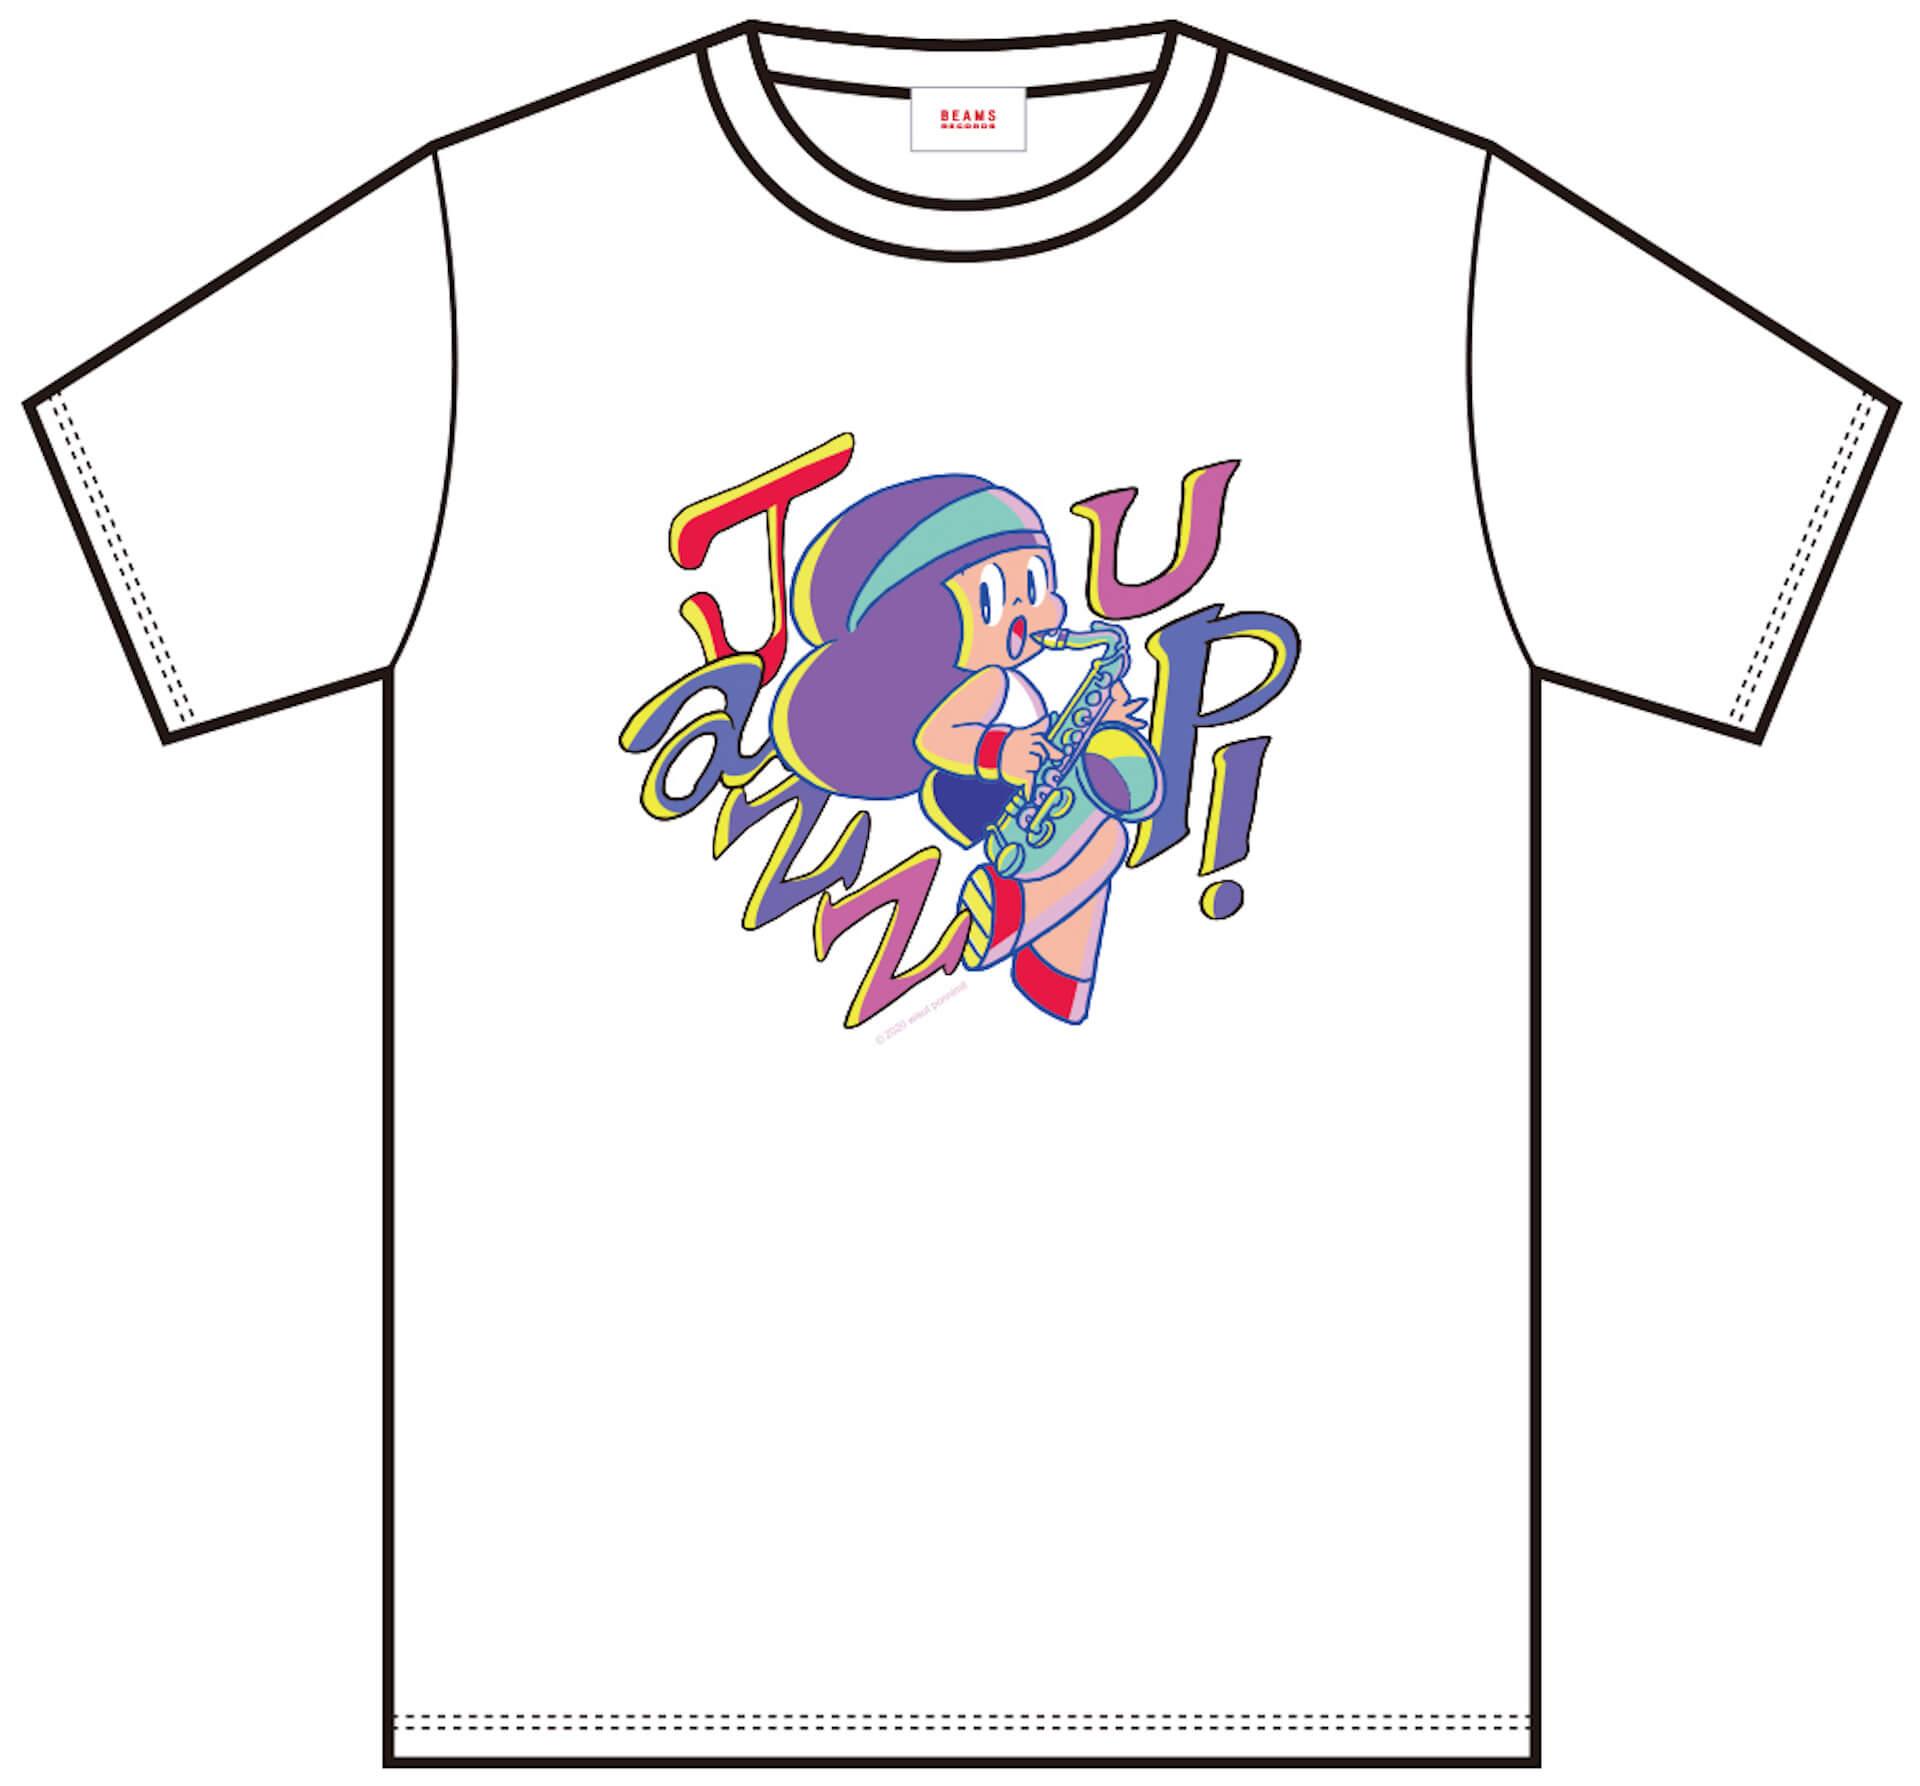 J-WAVE「#音楽を止めるな」BEAMS RECORDS協力のもと、ライブハウスを支援するオリジナルTシャツが受注販売開始! lf200515_jwave_beamsrecords_tshirts_05